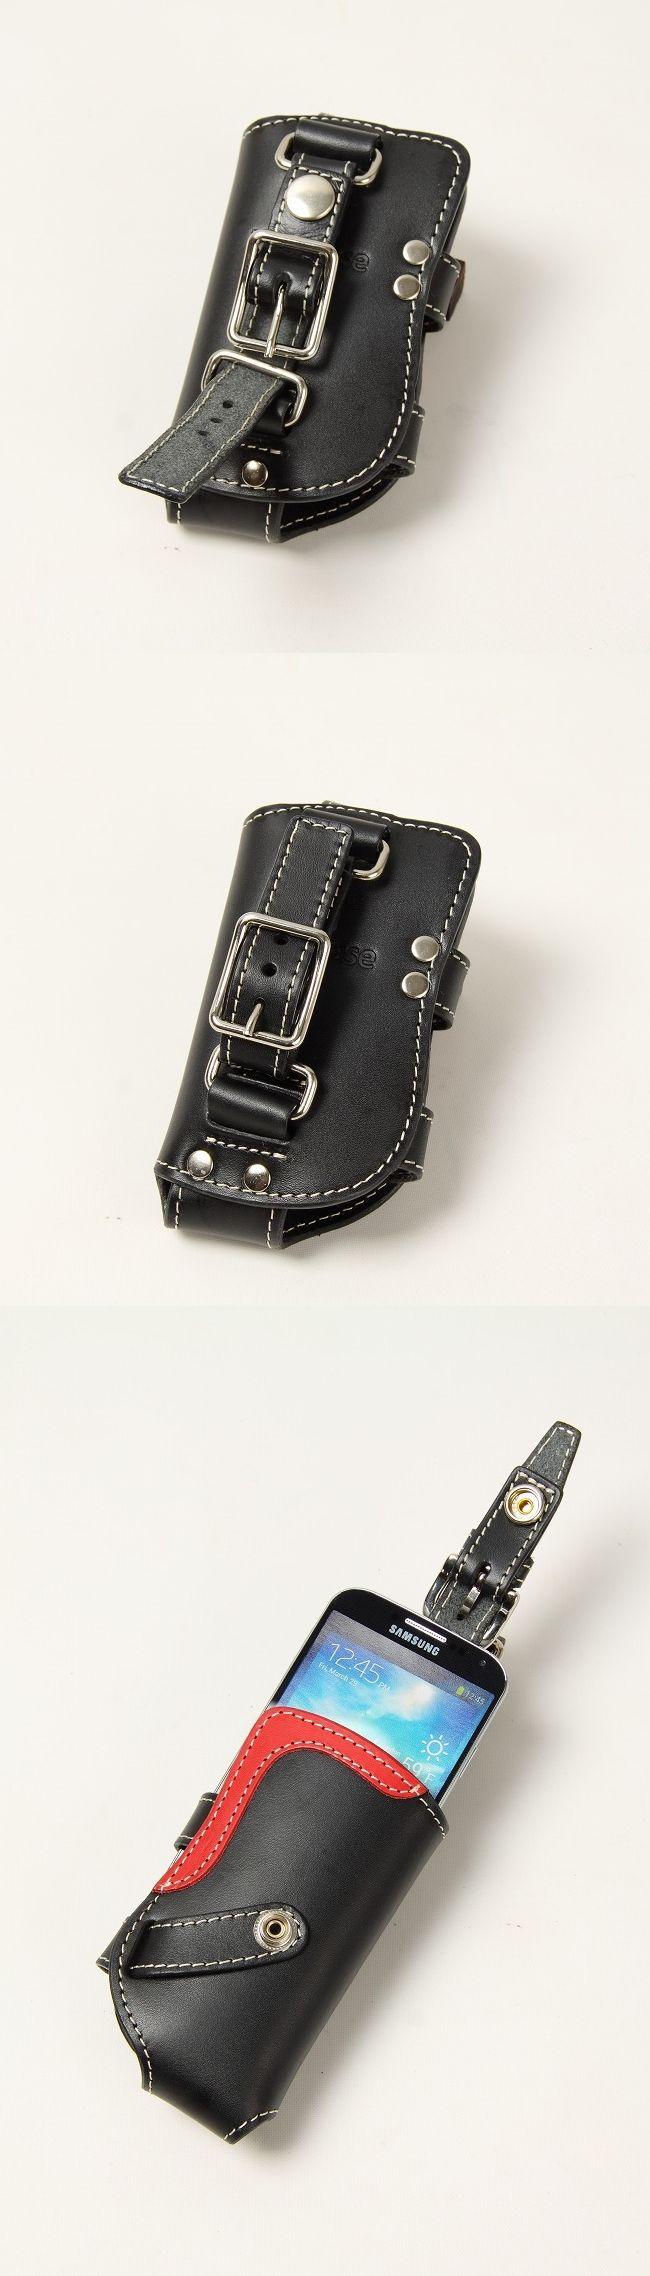 【DEGNER】Flicase 手機套 - 「Webike-摩托百貨」